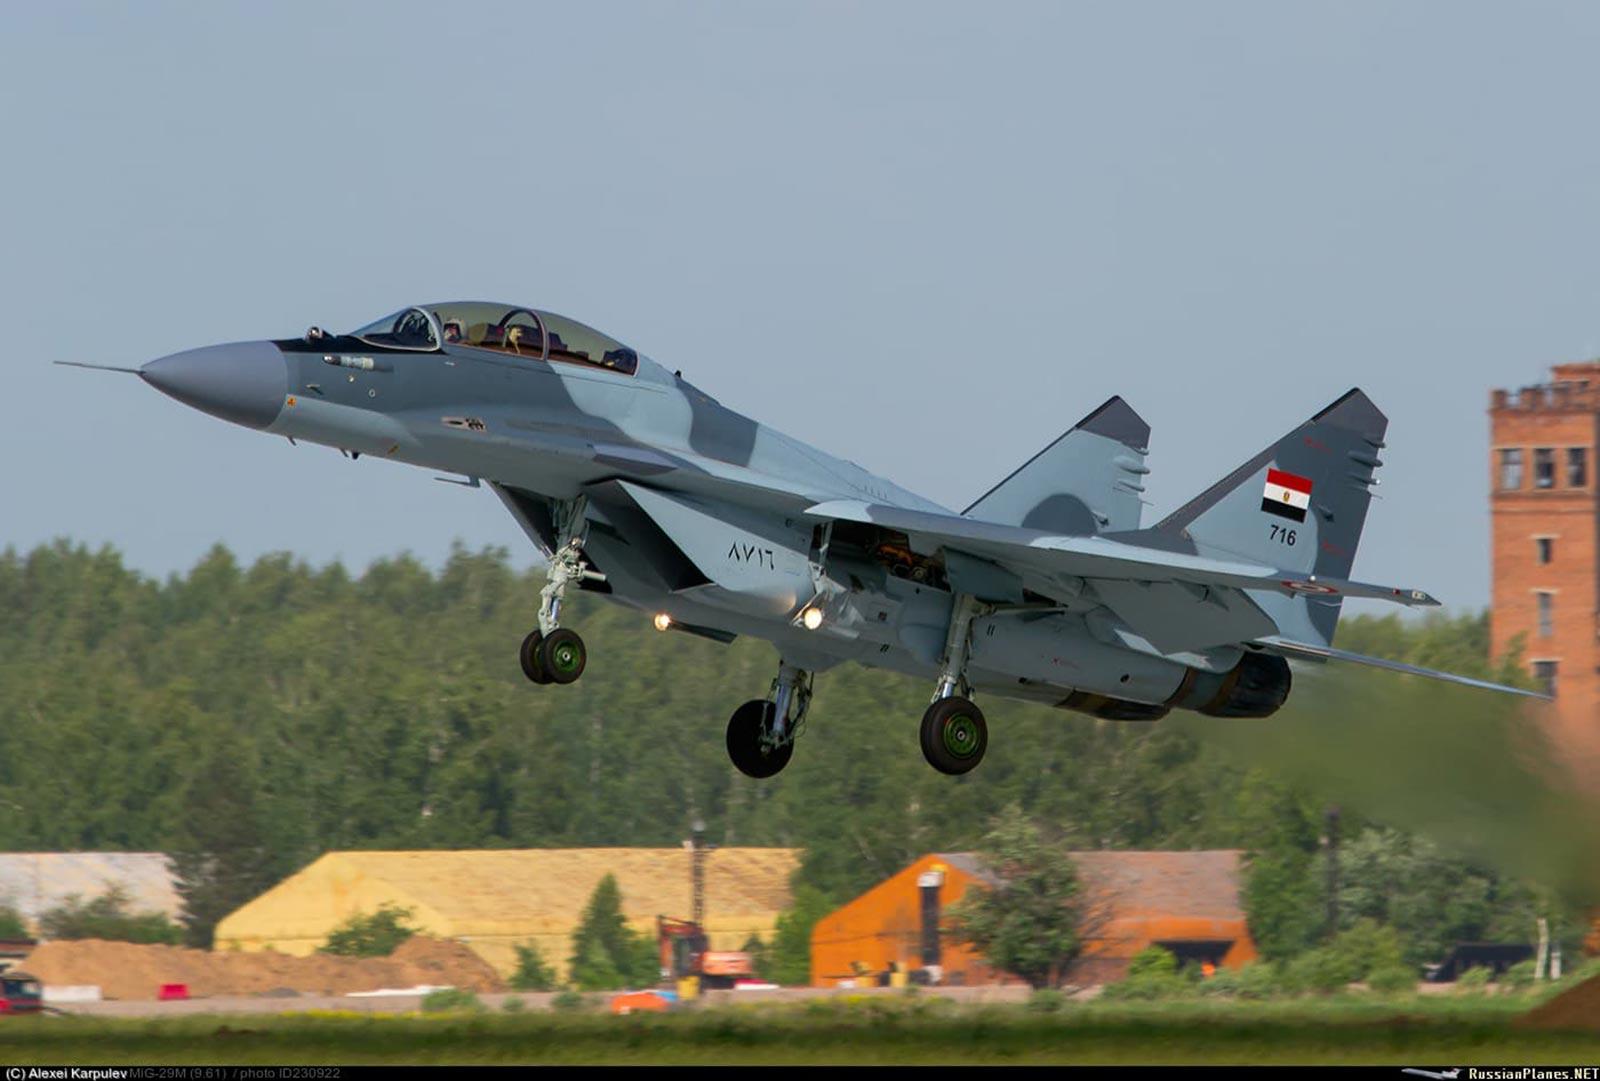 Egyptian Air Force (EAF) MiG-29 (716) multirole fighter Jet